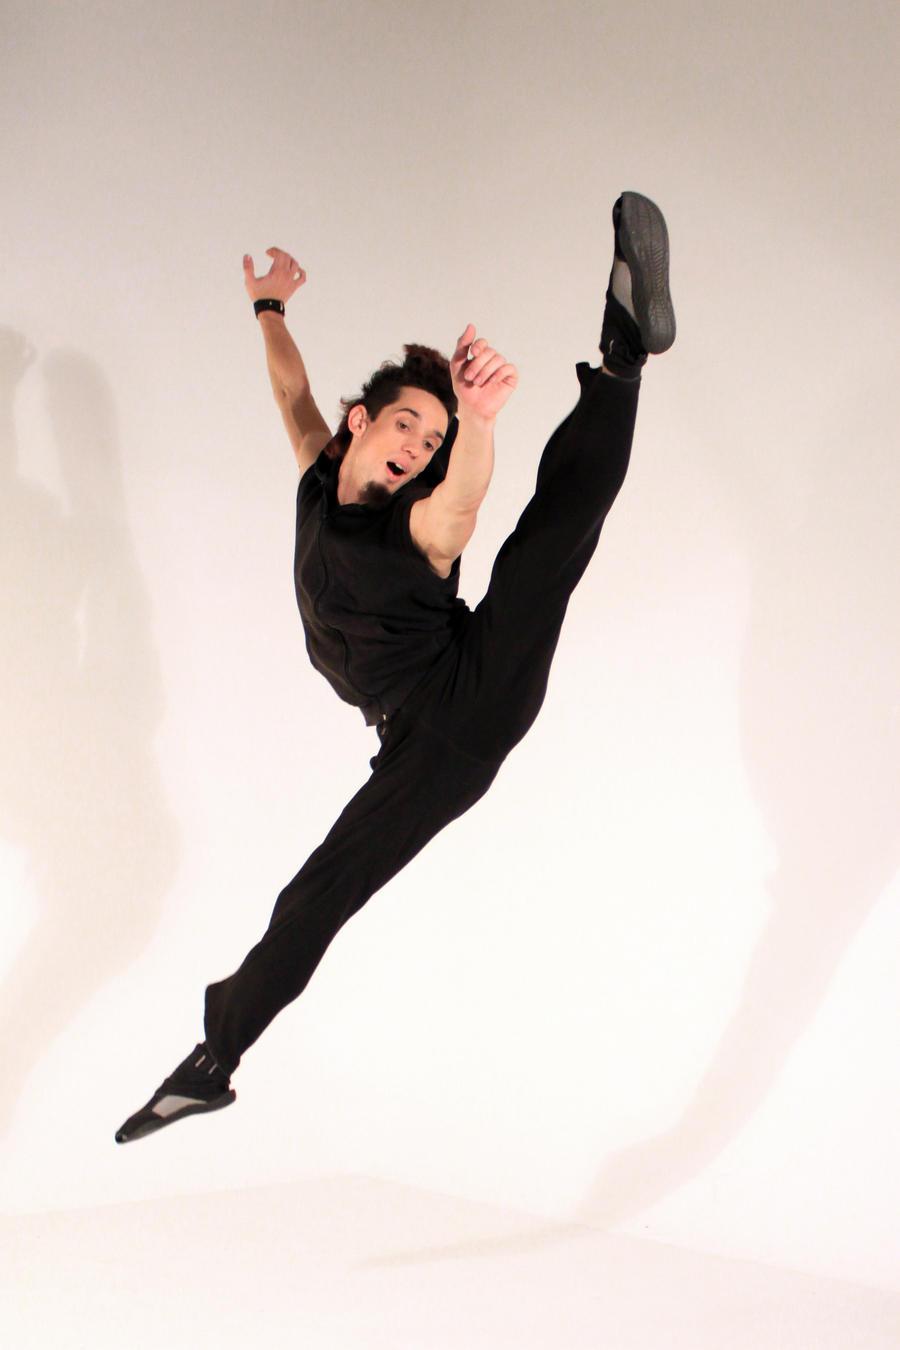 Dance11 14 by DaeStock